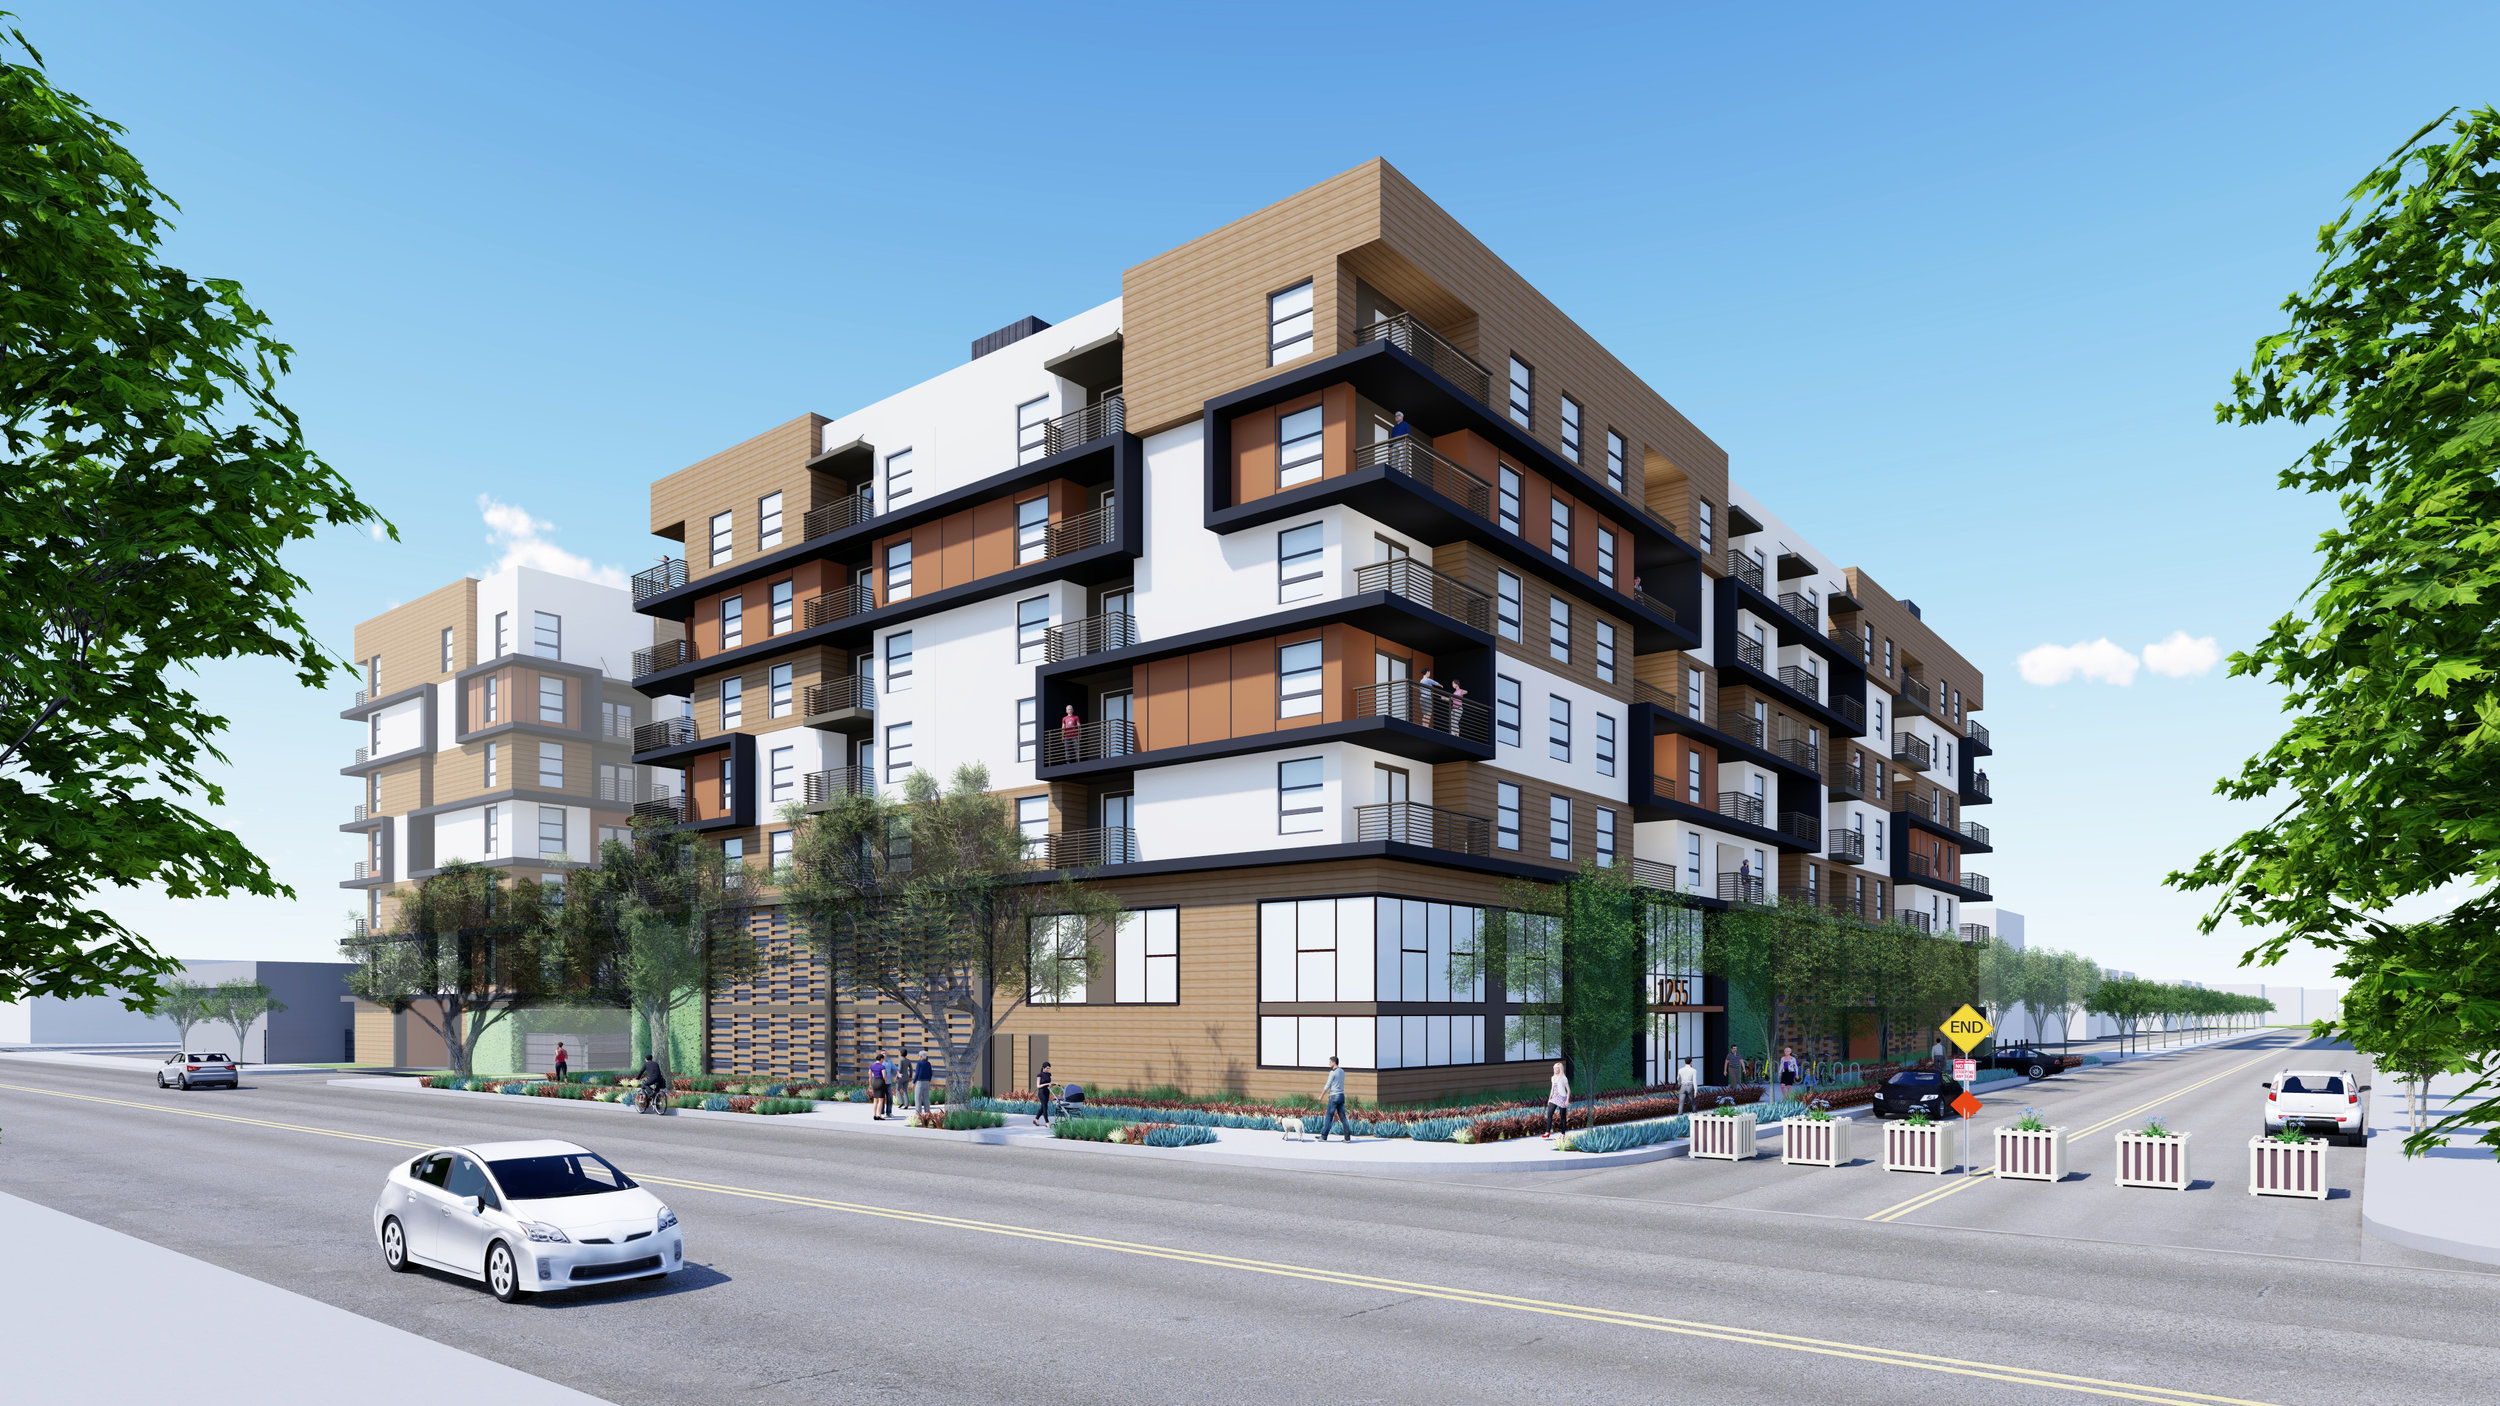 Elden Elms Apartments - WeHo Community Housing